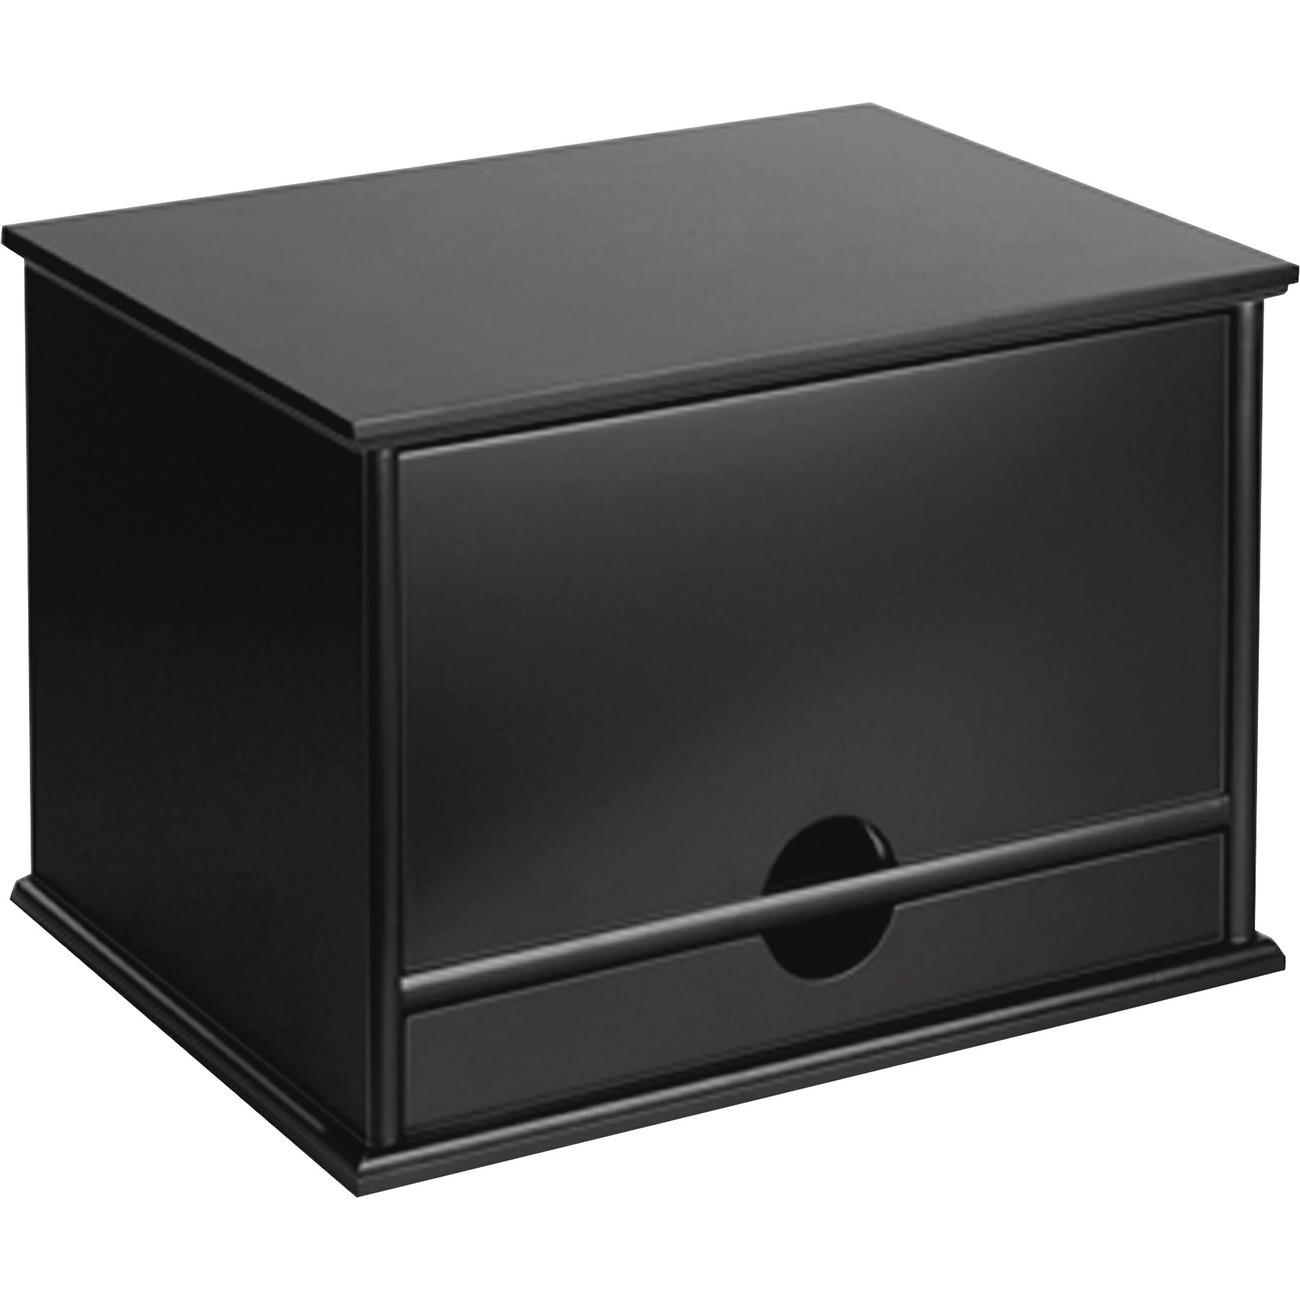 kamloops office systems office supplies desk. Black Bedroom Furniture Sets. Home Design Ideas